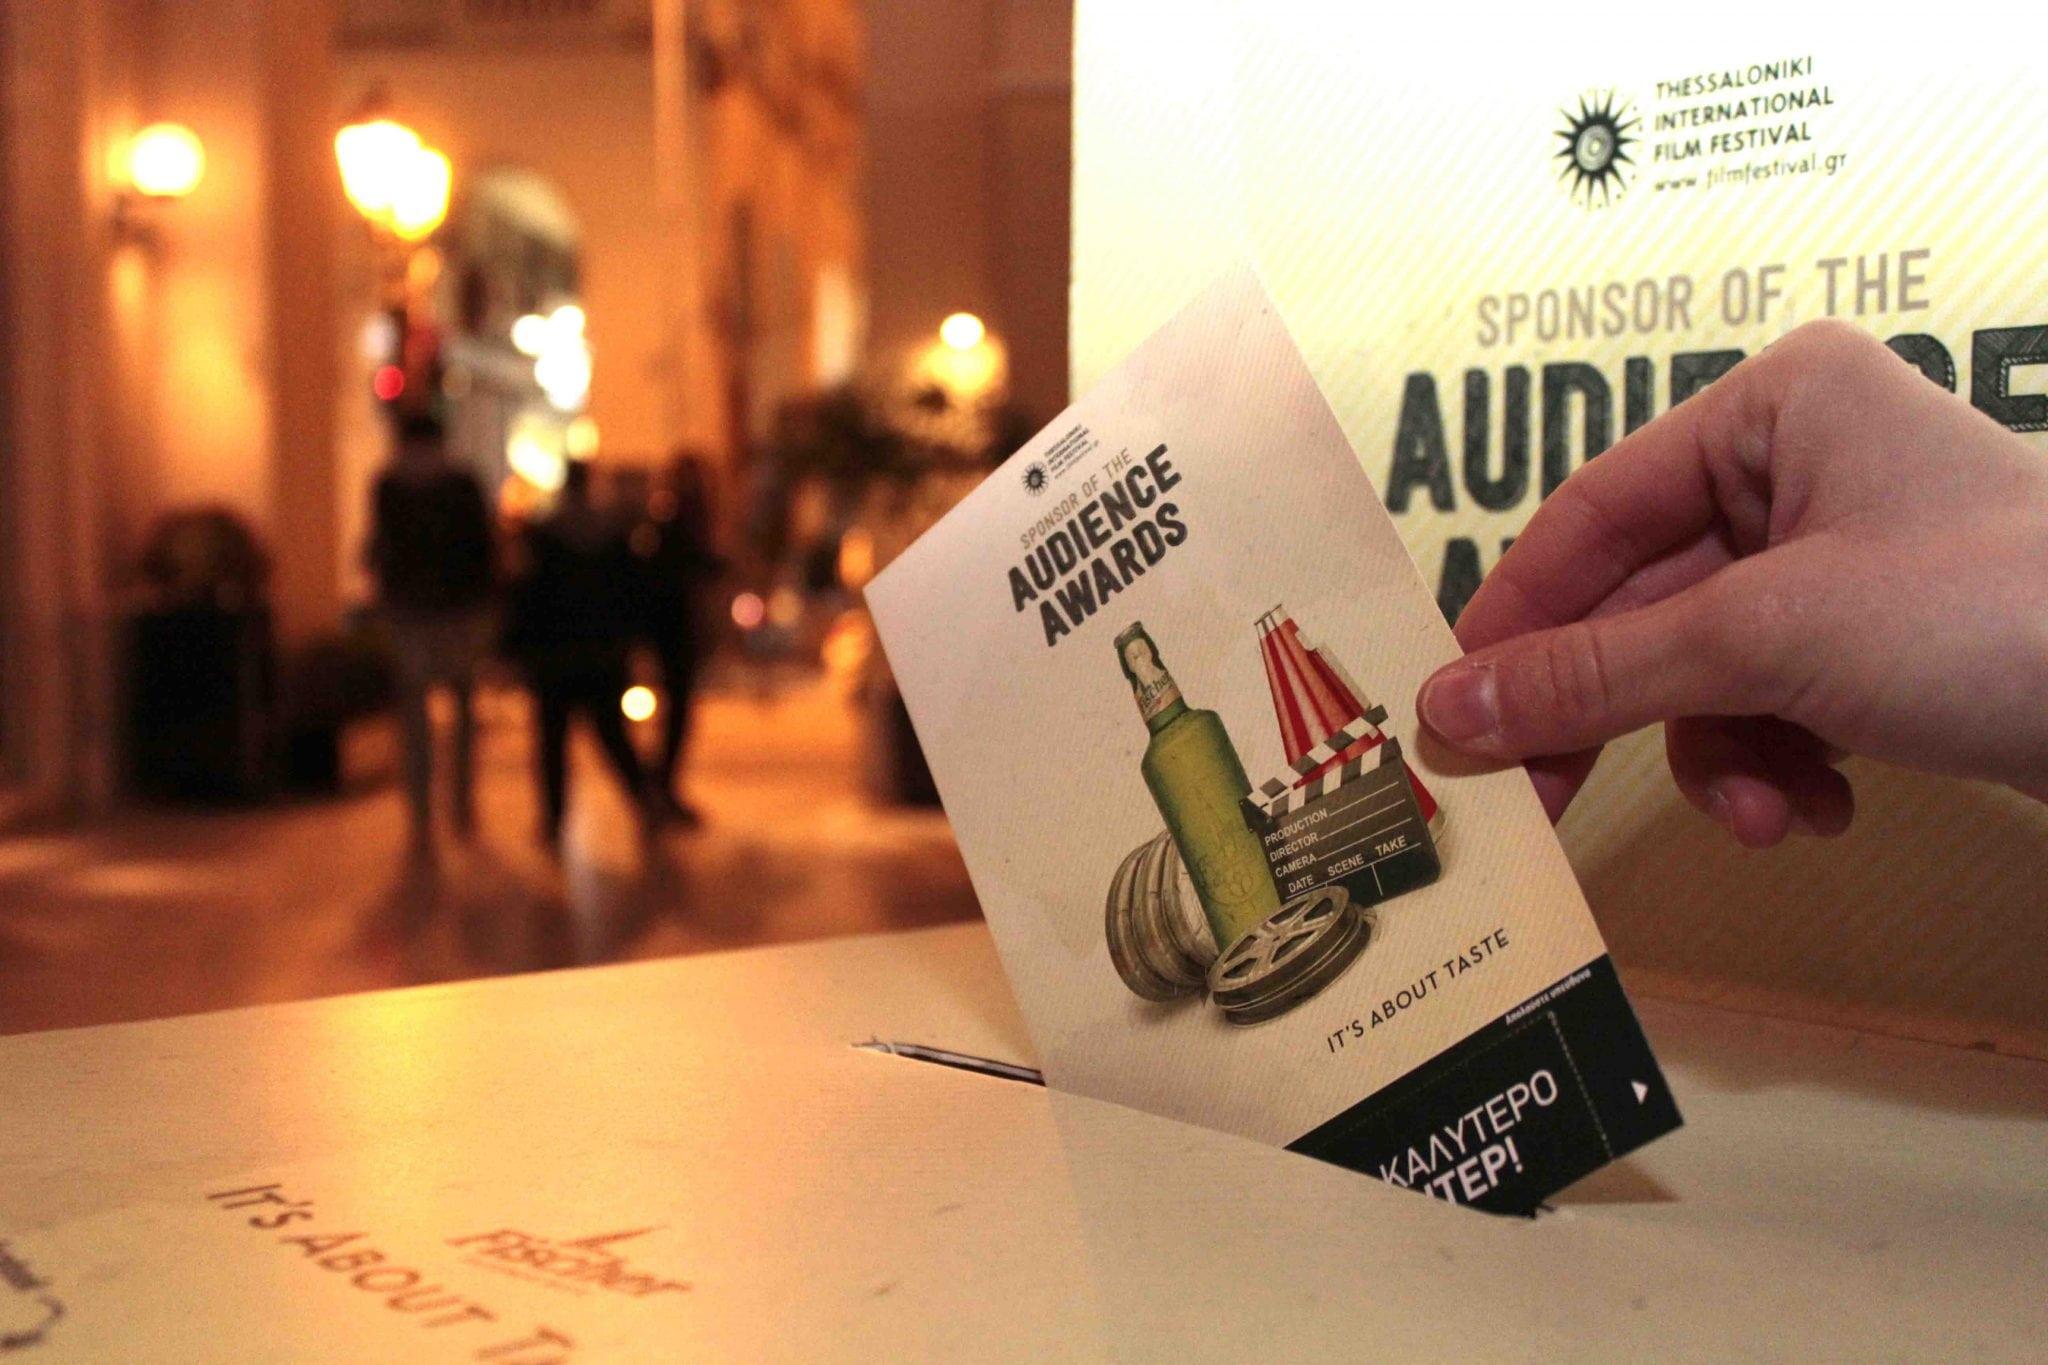 Fischer_4_Βραβεία Κοινού Fischer στο Φεστιβάλ Ντοκιμαντέρ Θεσσαλονίκης